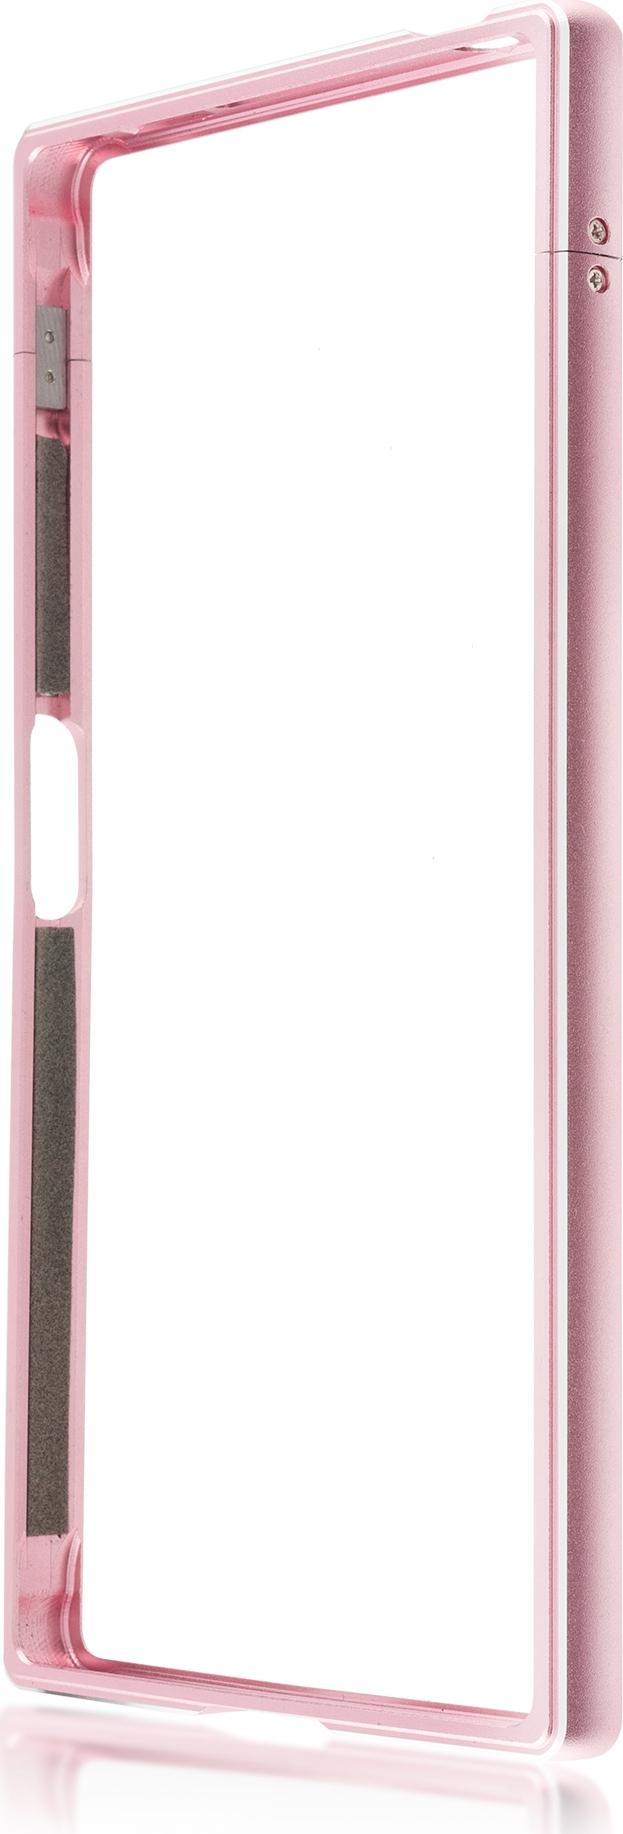 Чехол Brosco BMP для Sony Xperia XZ1, розовый